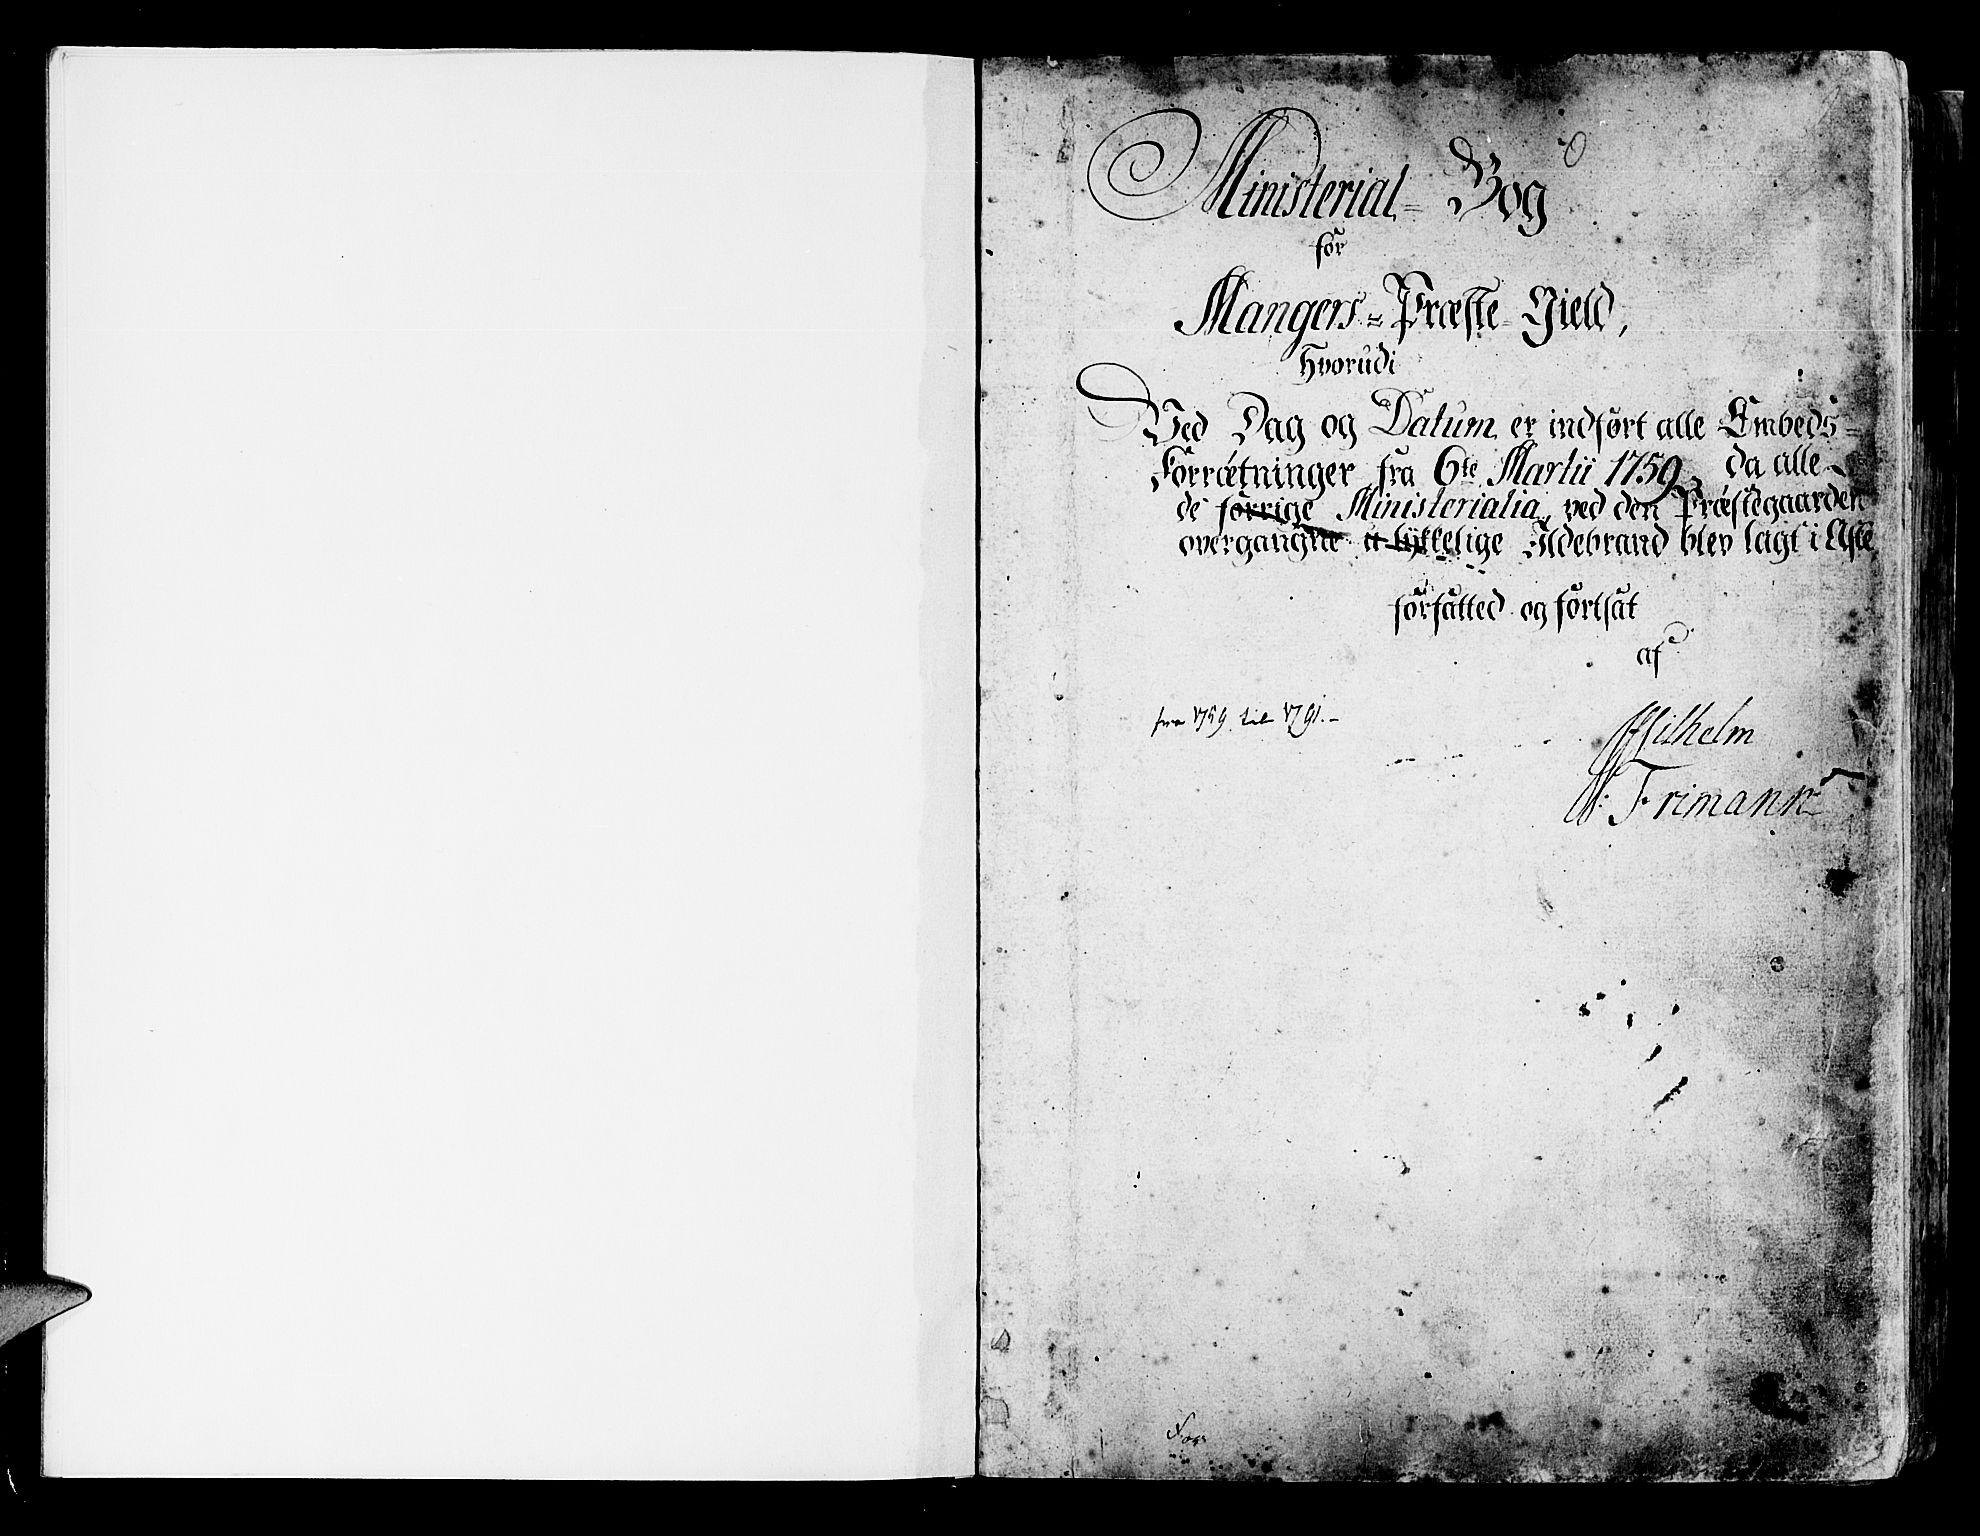 SAB, Manger sokneprestembete, H/Haa: Ministerialbok nr. A 1, 1759-1791, s. 1